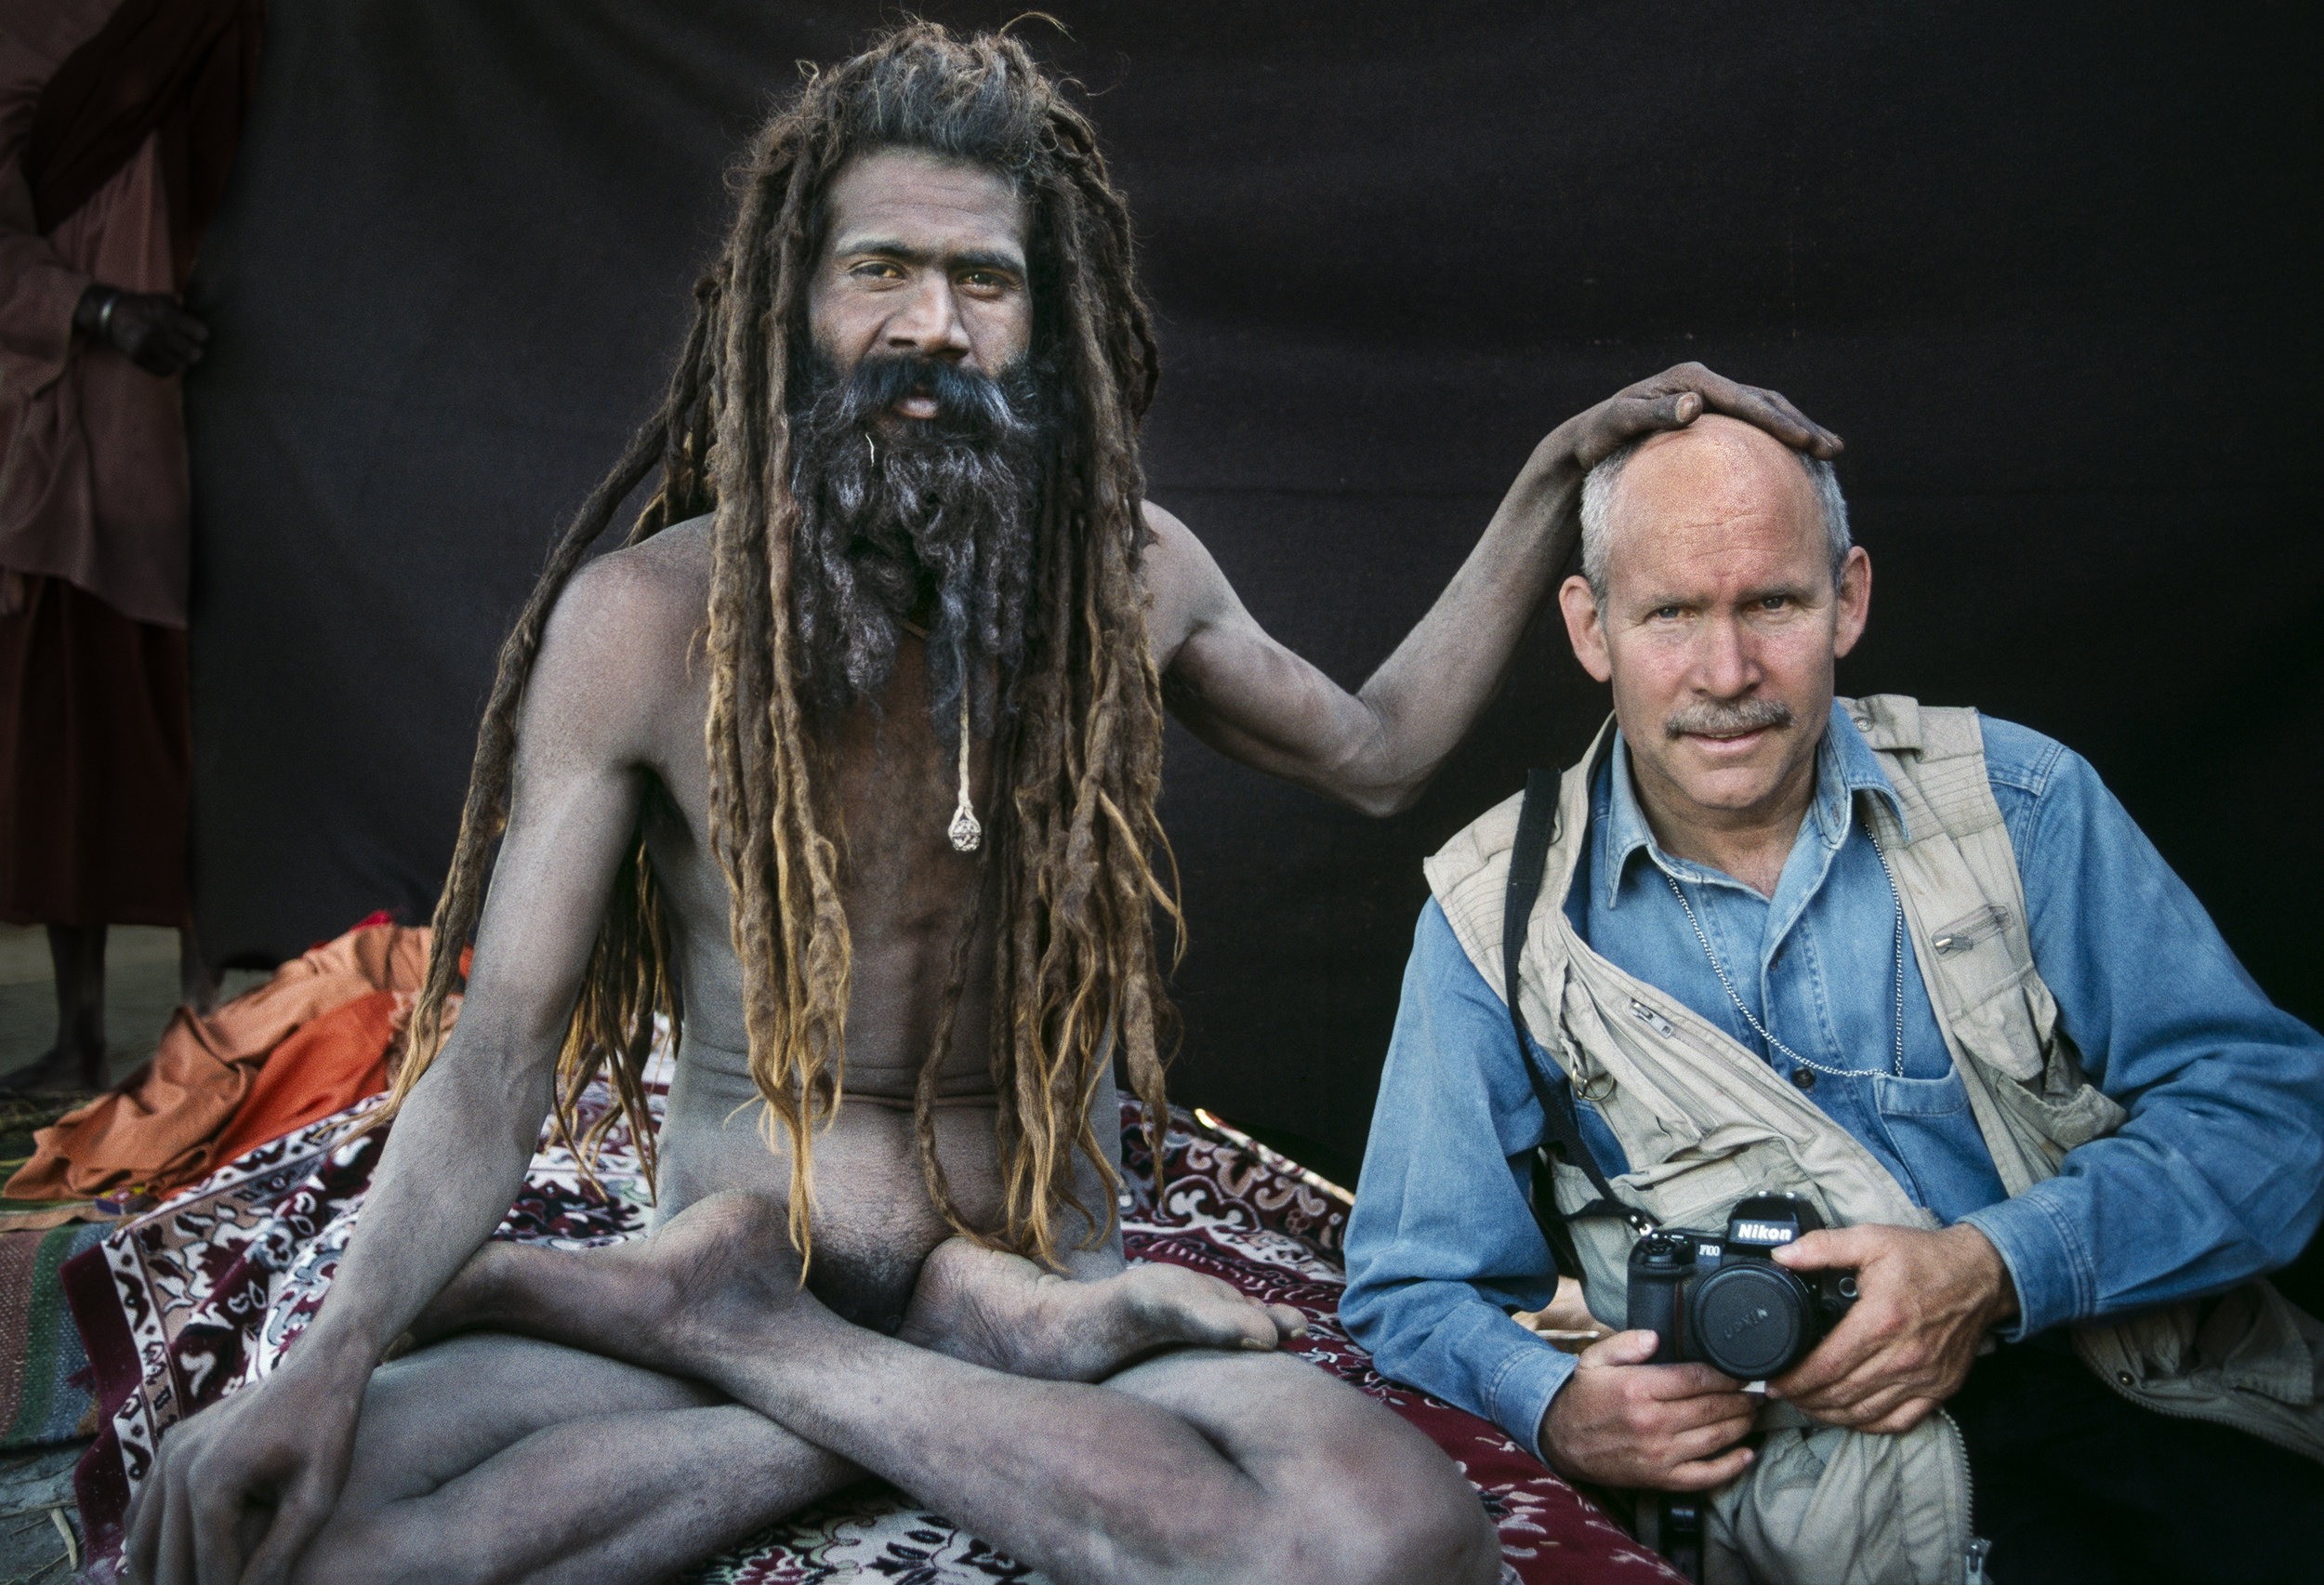 India, 2001 - Copyright: Steve McCurry ©